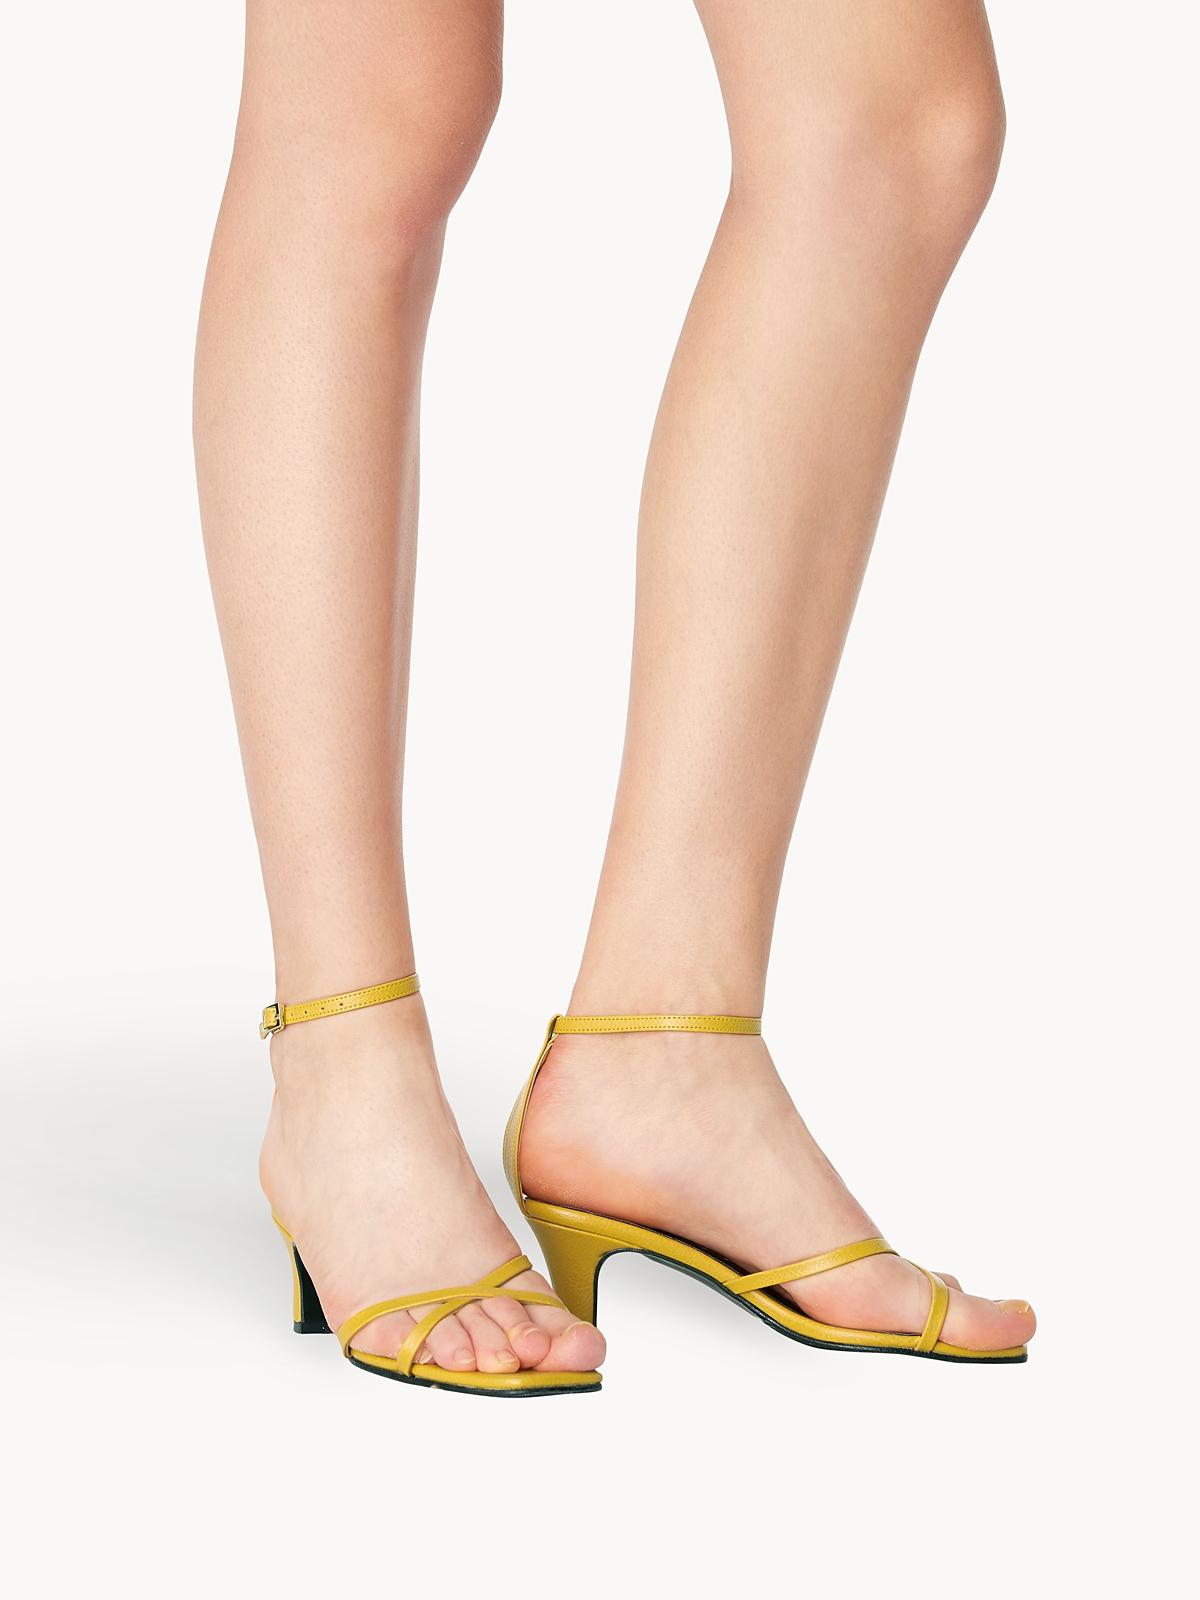 Plush Studios Kade Heels Yellow